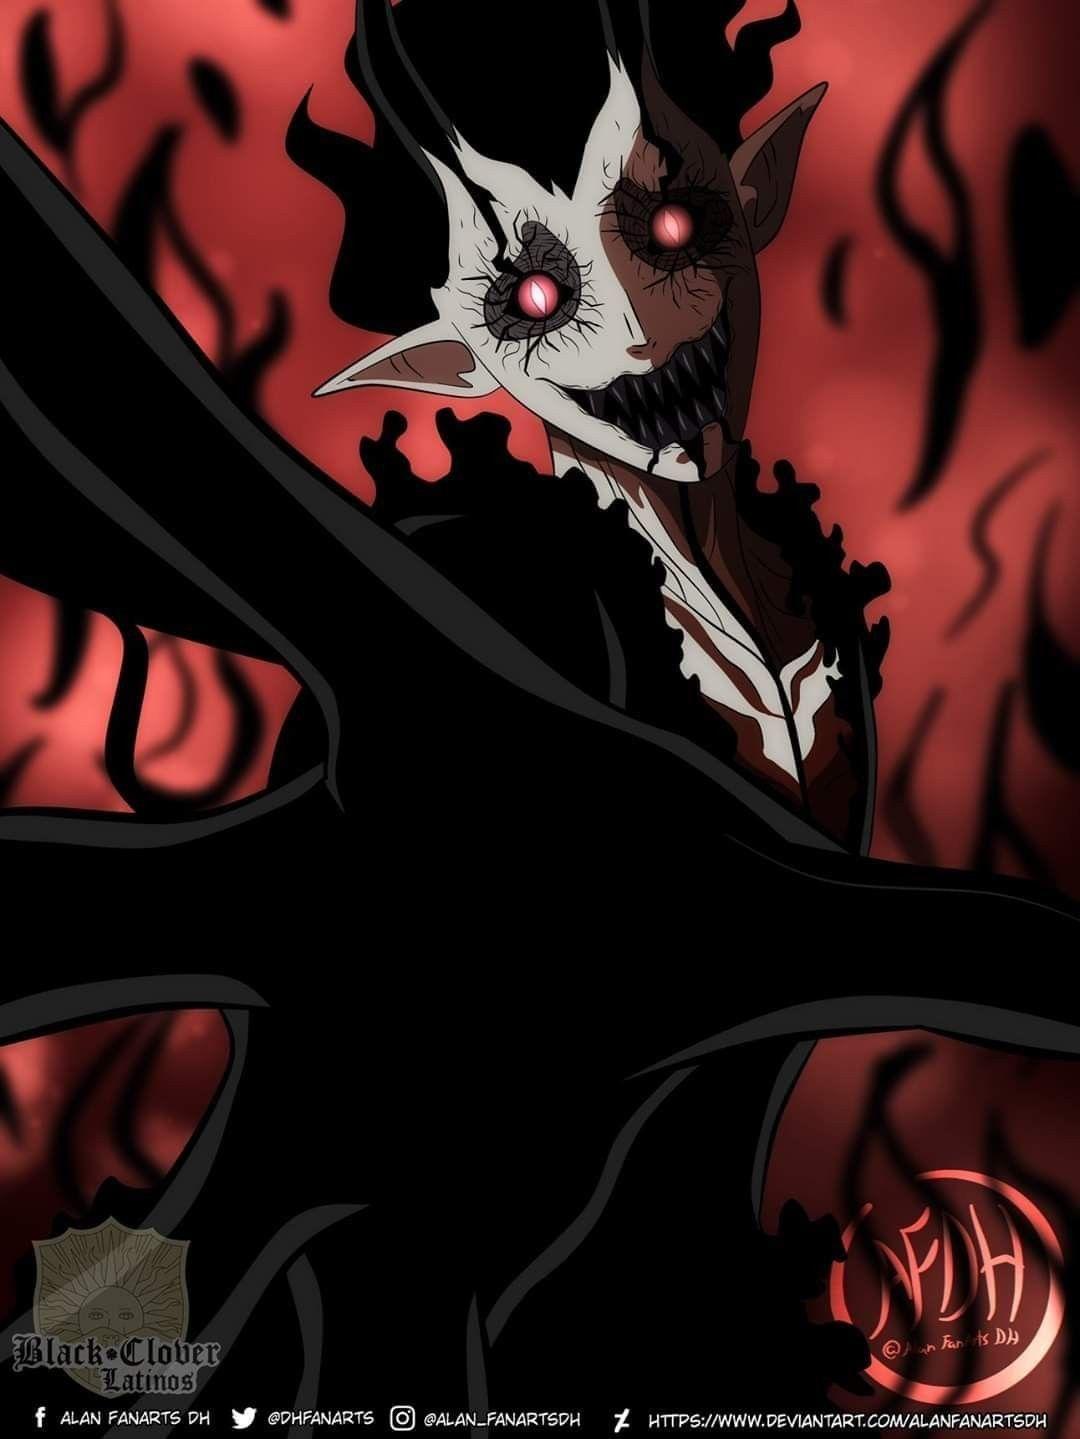 Black Clover Devil Wallpapers Top Free Black Clover Devil Backgrounds Wallpaperaccess